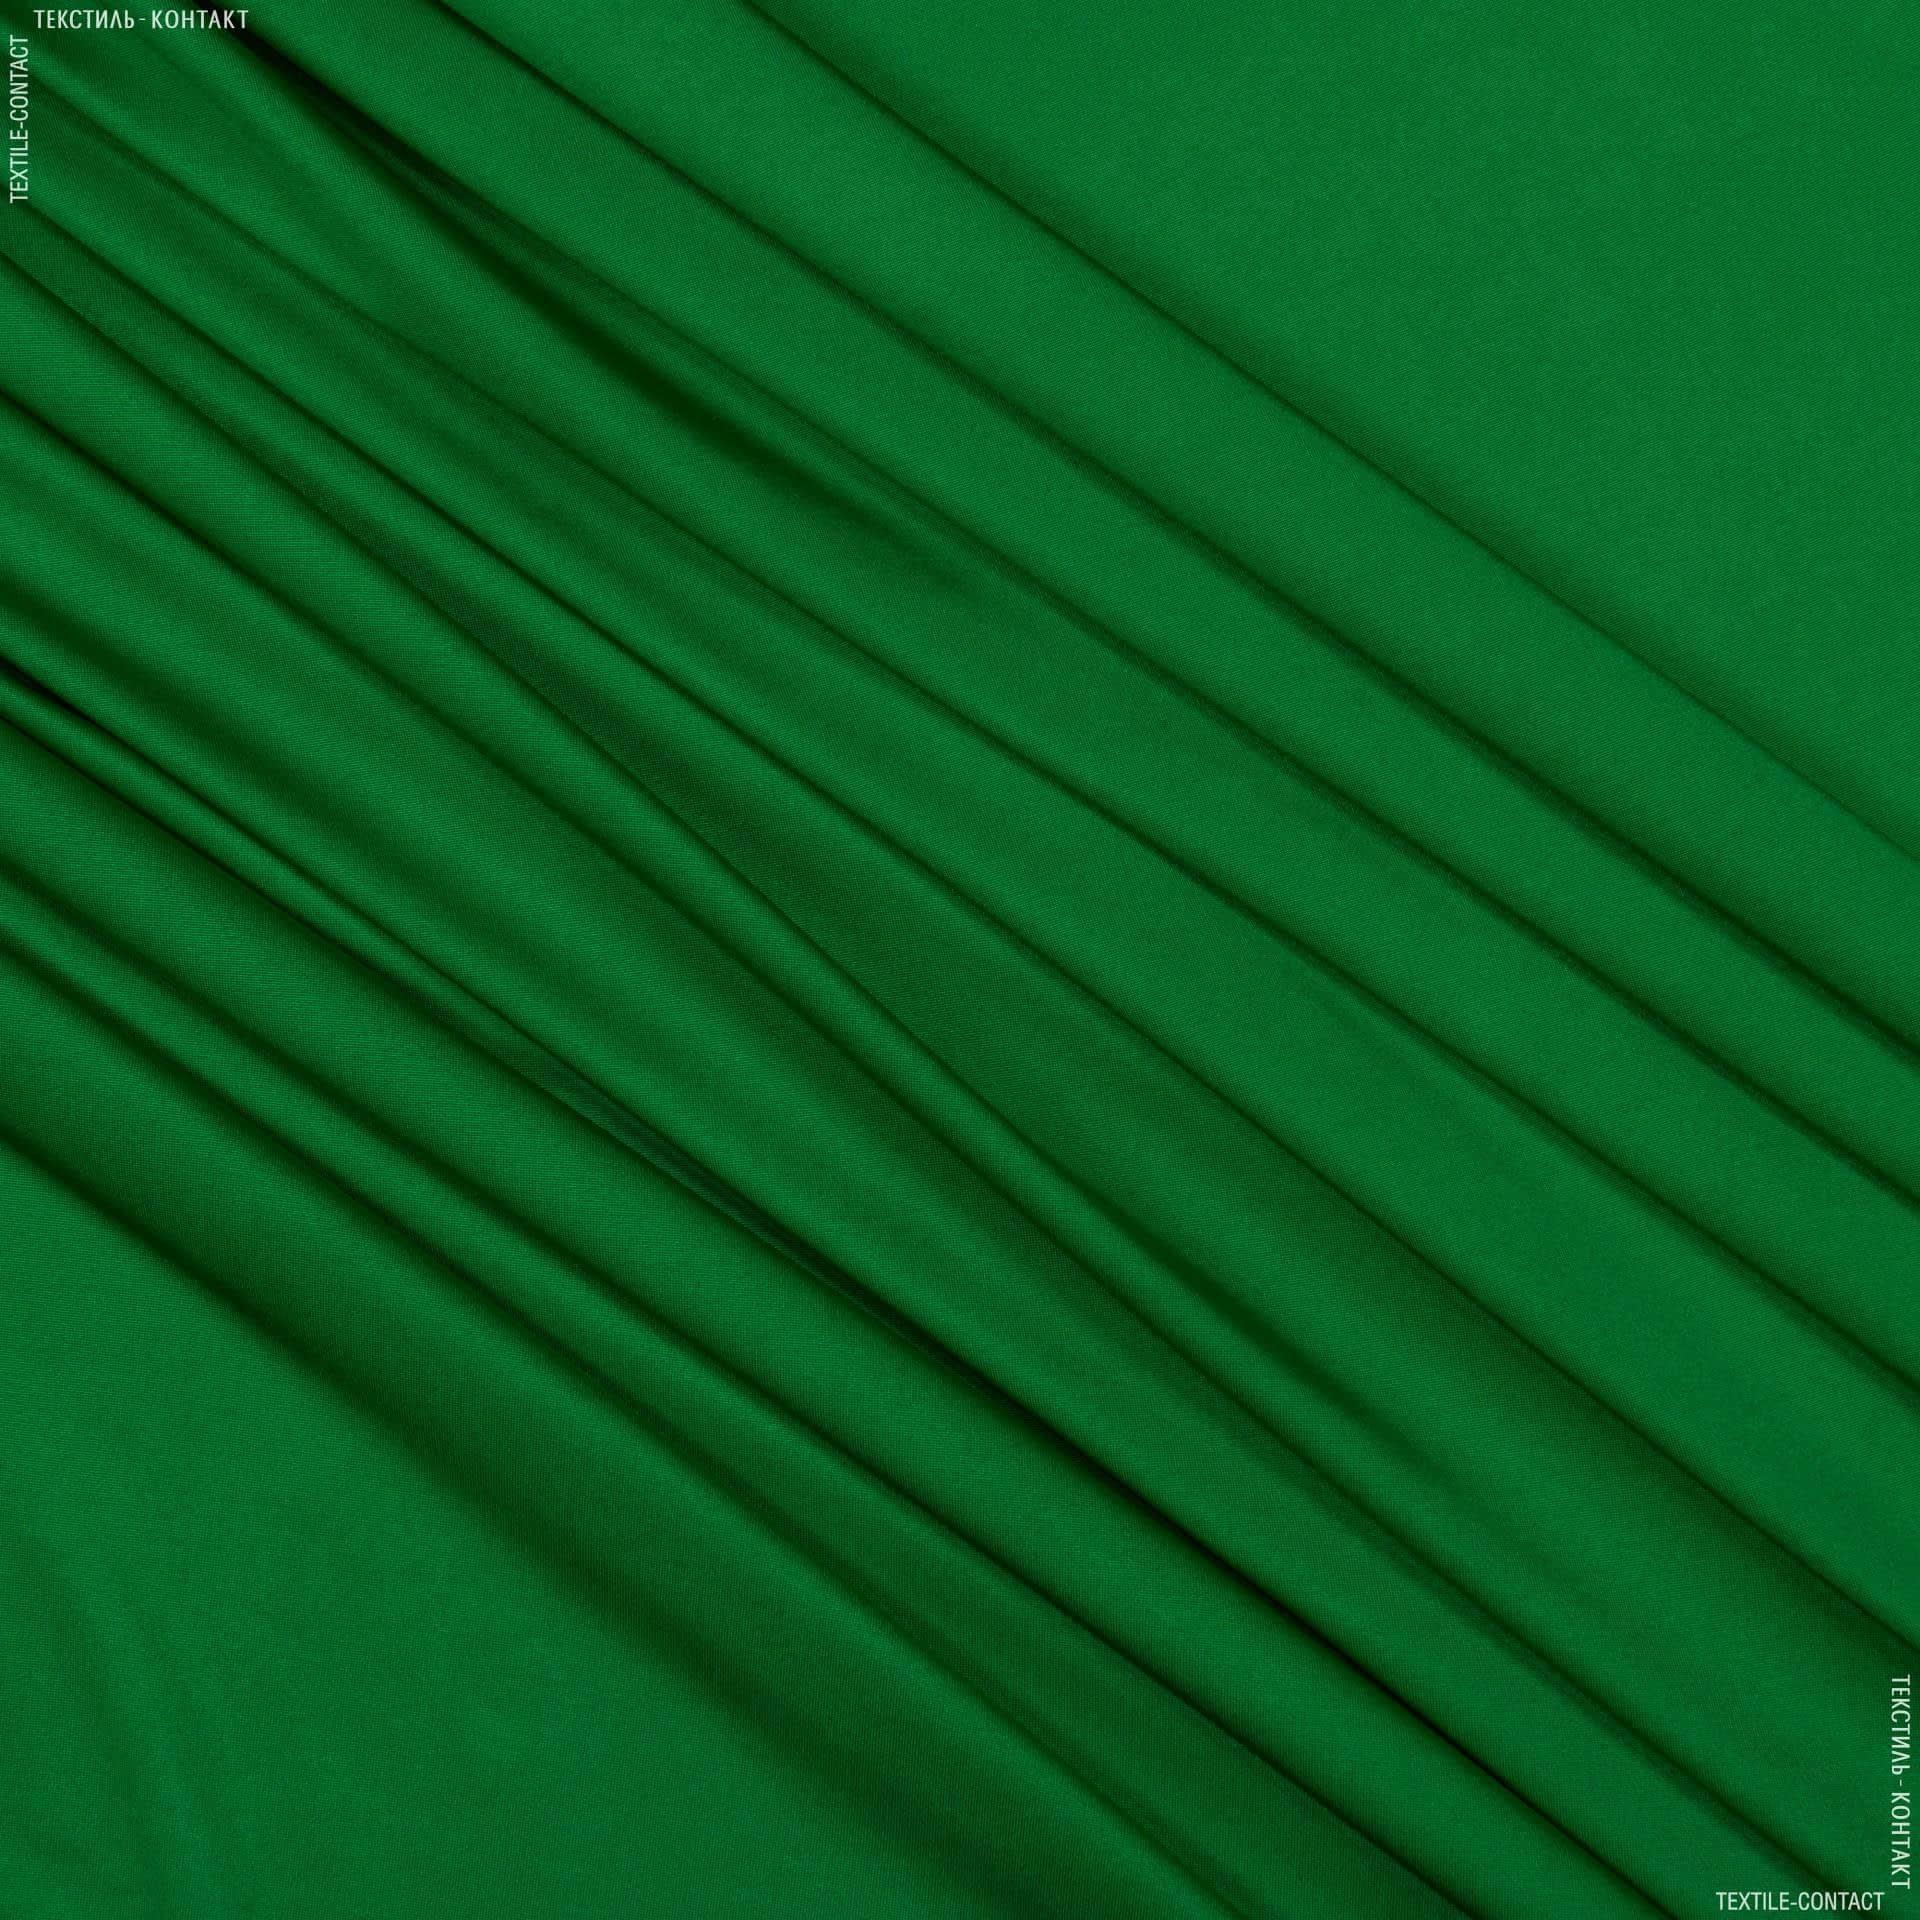 Ткани для платьев - Трикотаж жасмин зеленый